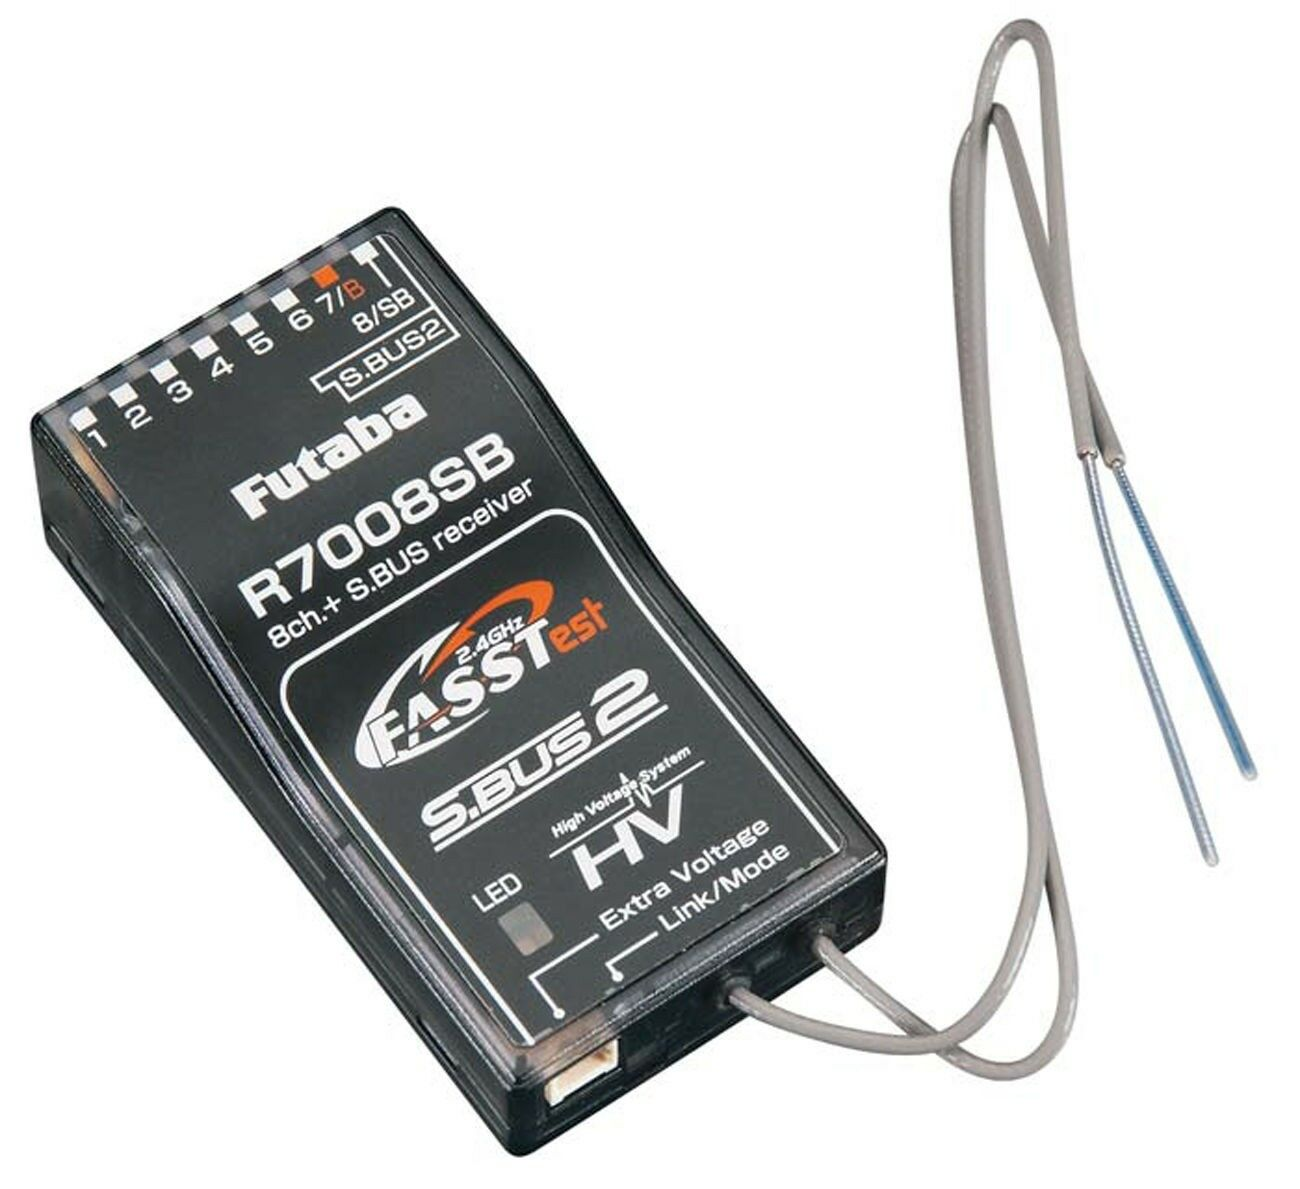 Futaba 8 Canales S. BUS 2 fasstest 2.4GHz receptor para 18MZ 14SG R7008SB